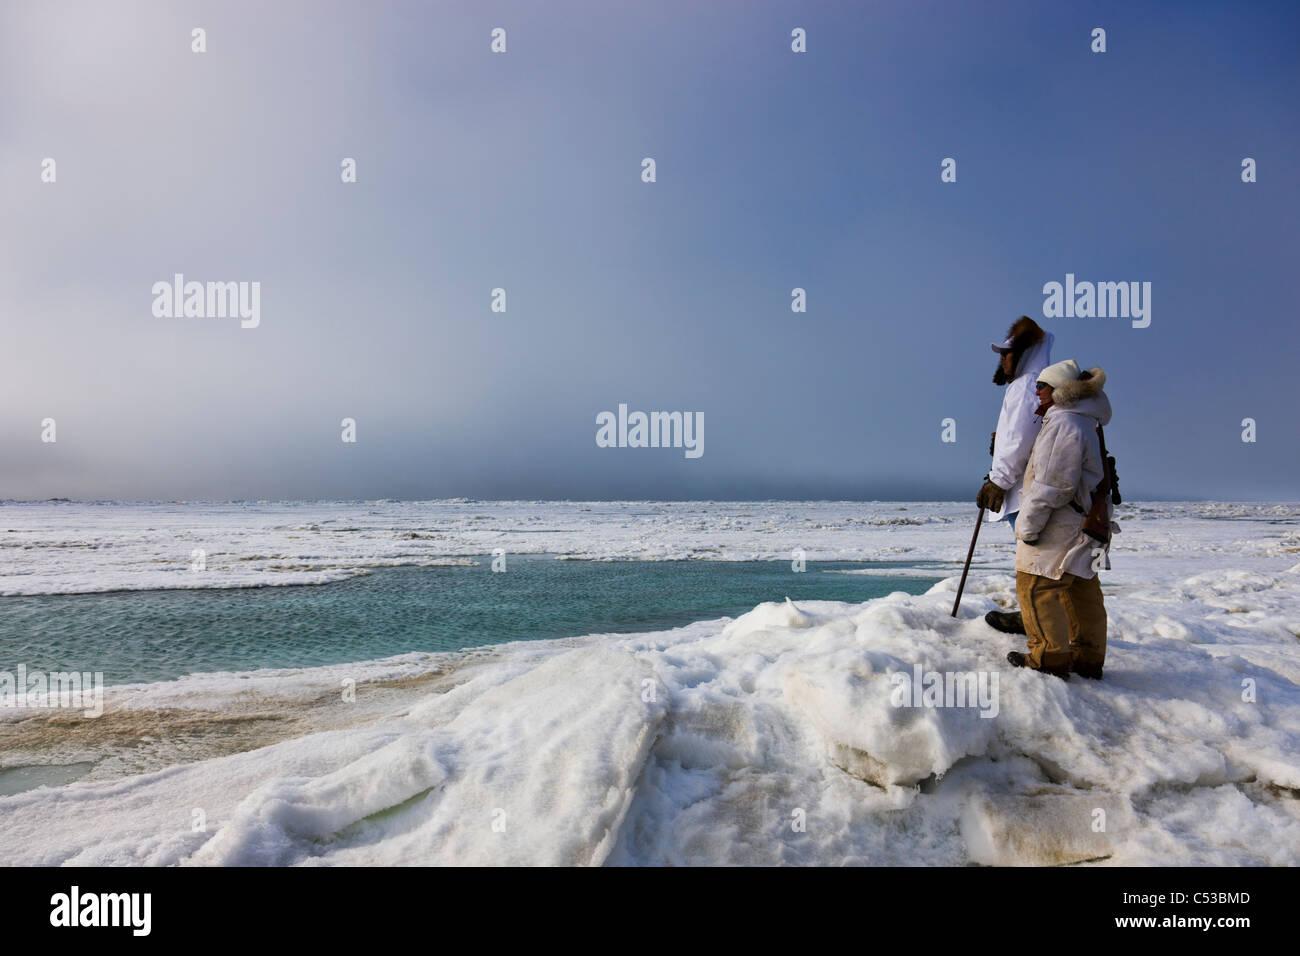 Chukchi Woman Stock Photos & Chukchi Woman Stock Images - Alamy